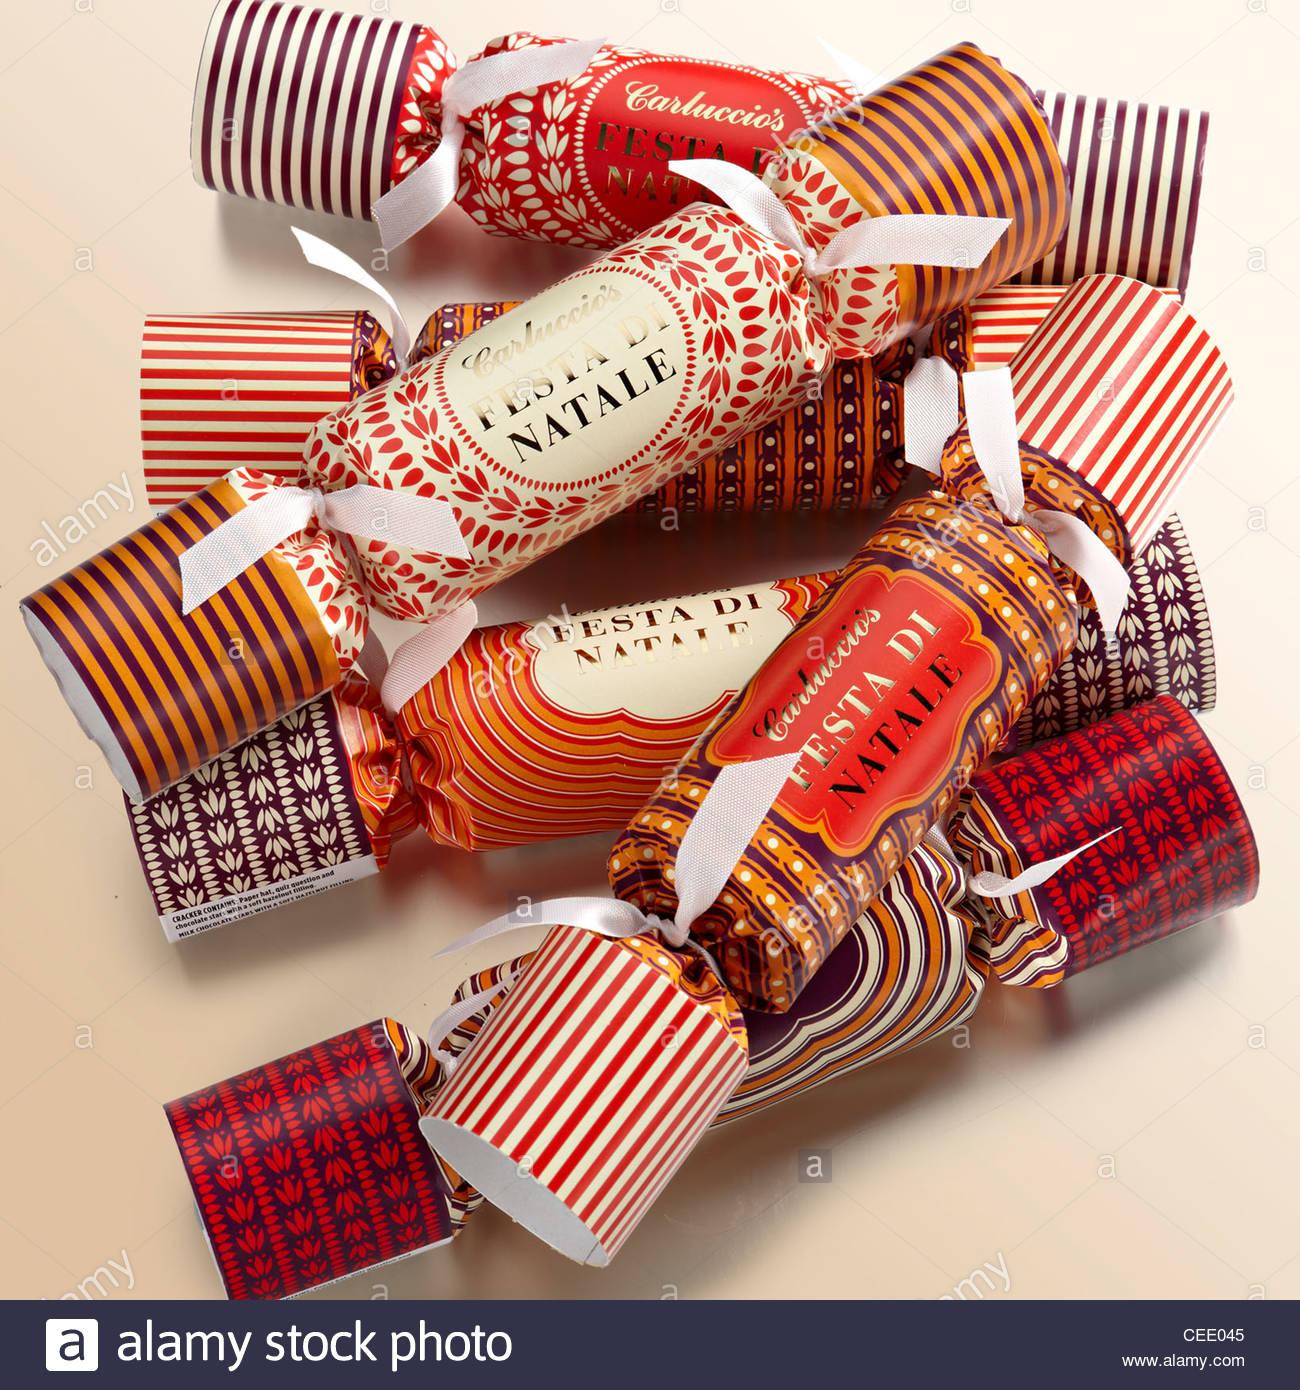 selection Christmas crackers - Stock Image